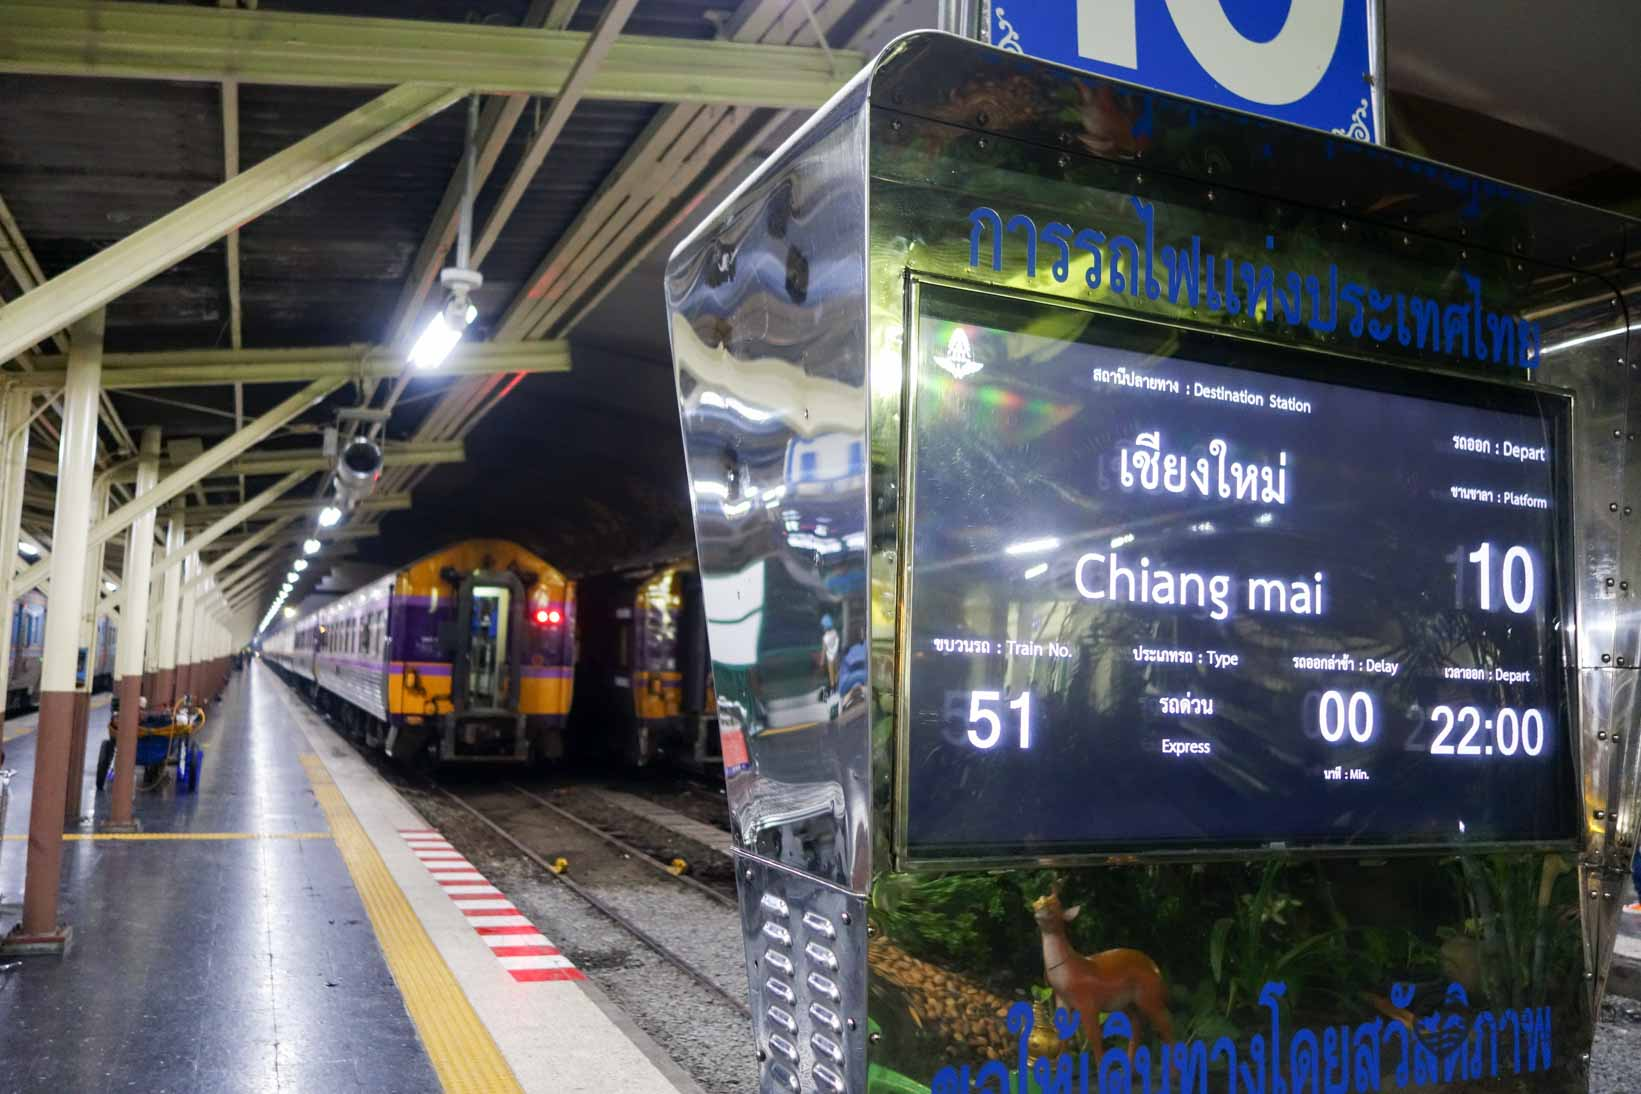 Im Hauptbahnhof Hua Lamphong in Bangkok - Abfahrt nach Chiang Mai um 22.00 Uhr